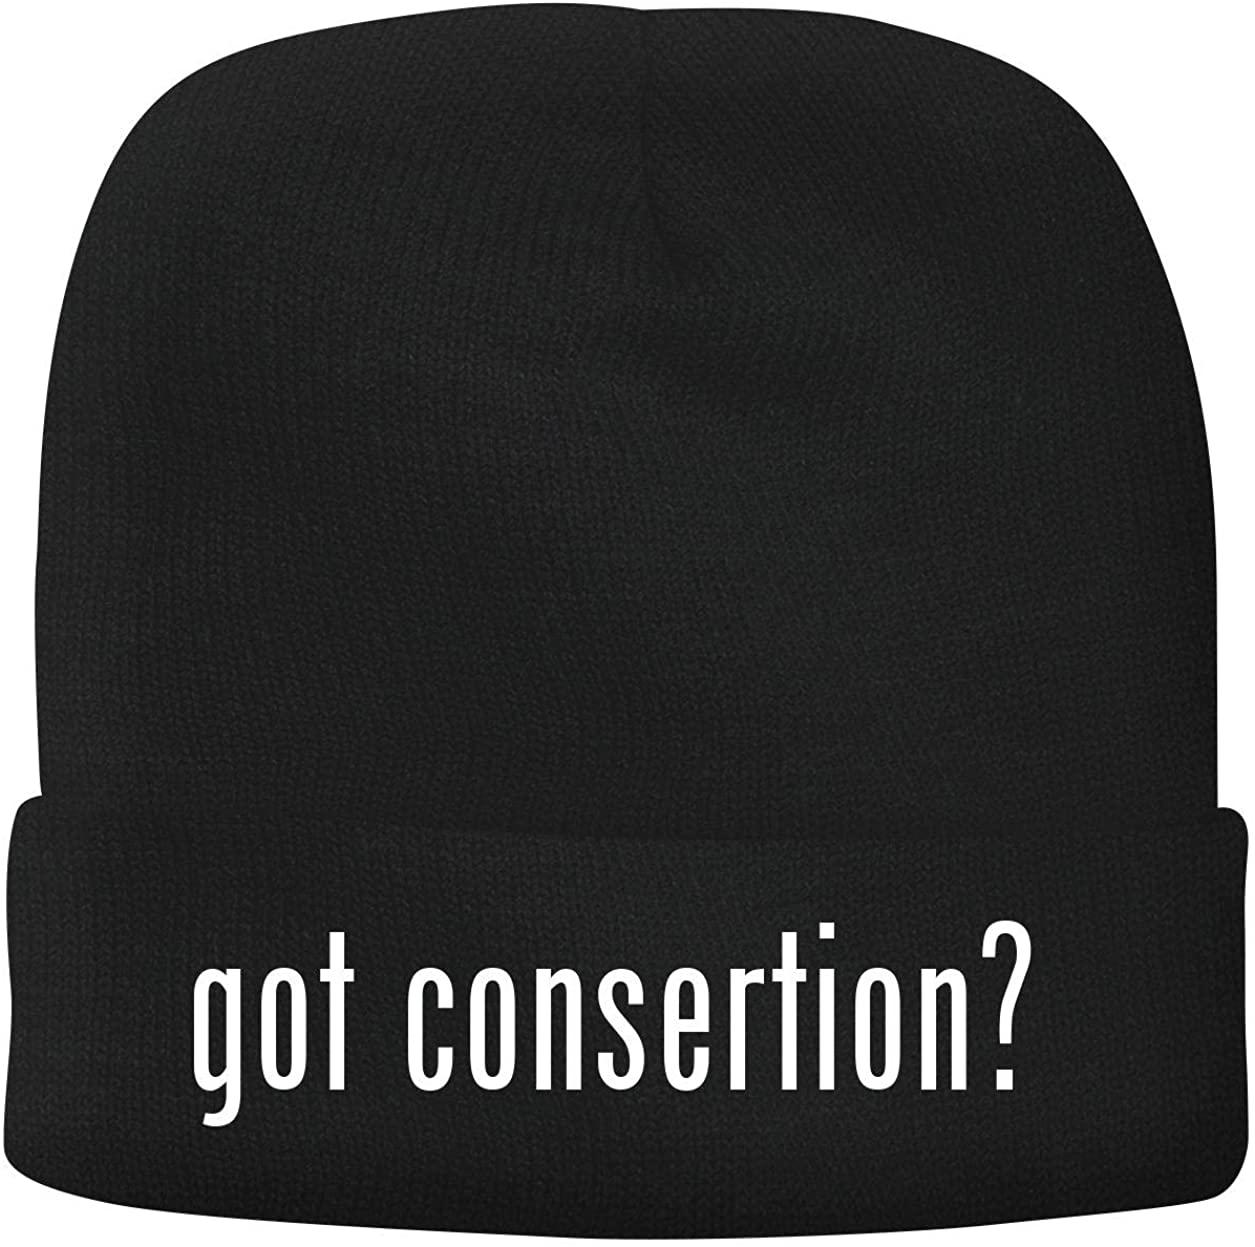 BH Cool Designs got Consertion? - Men's Soft & Comfortable Beanie Hat Cap